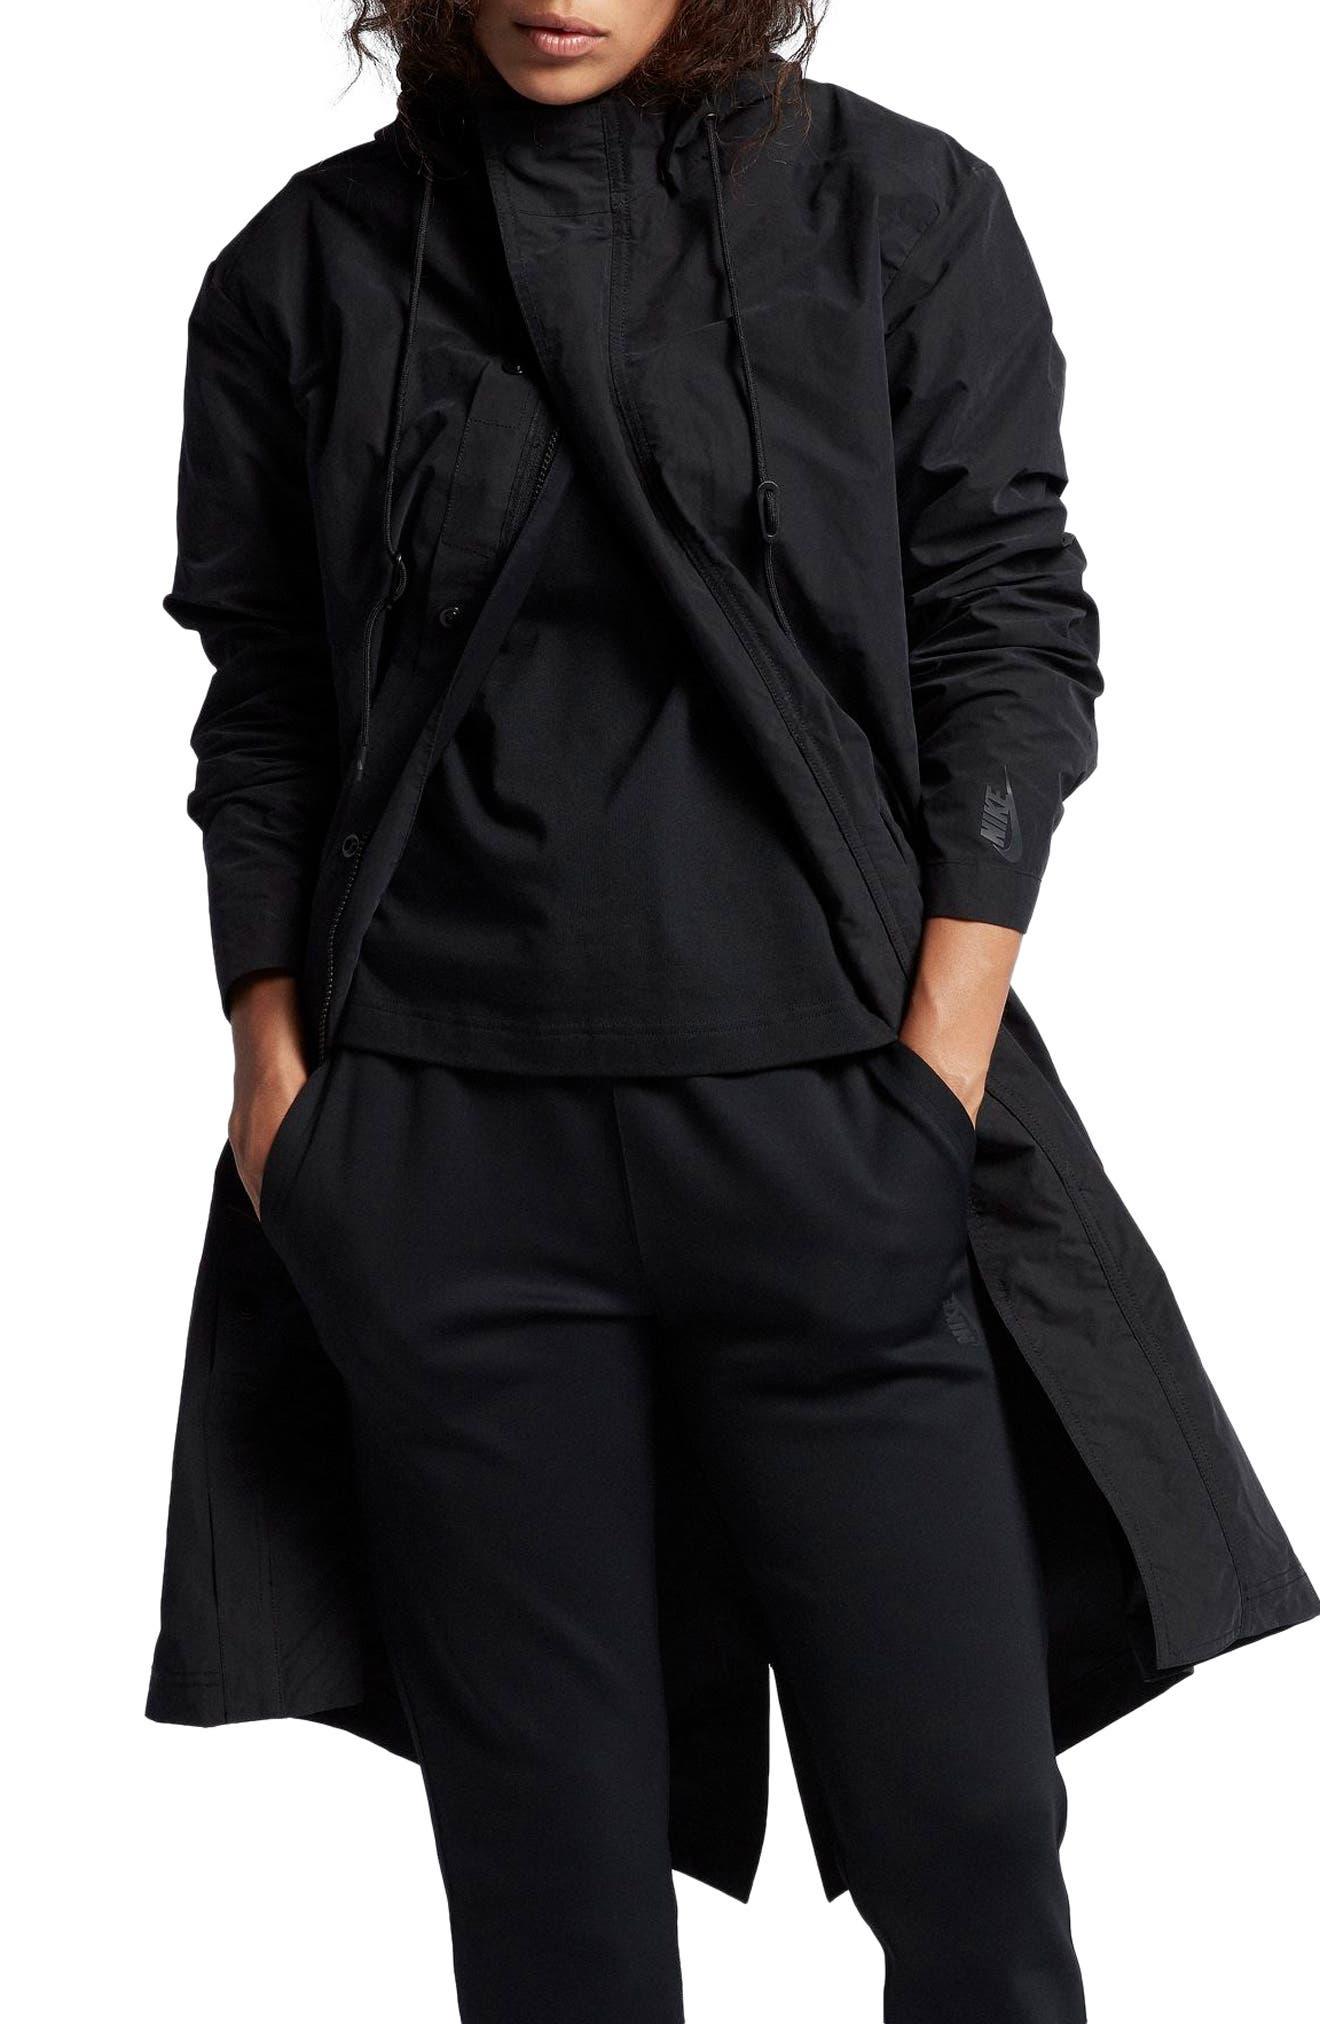 NikeLab Essentials Women's Parka,                         Main,                         color, Black/ Black